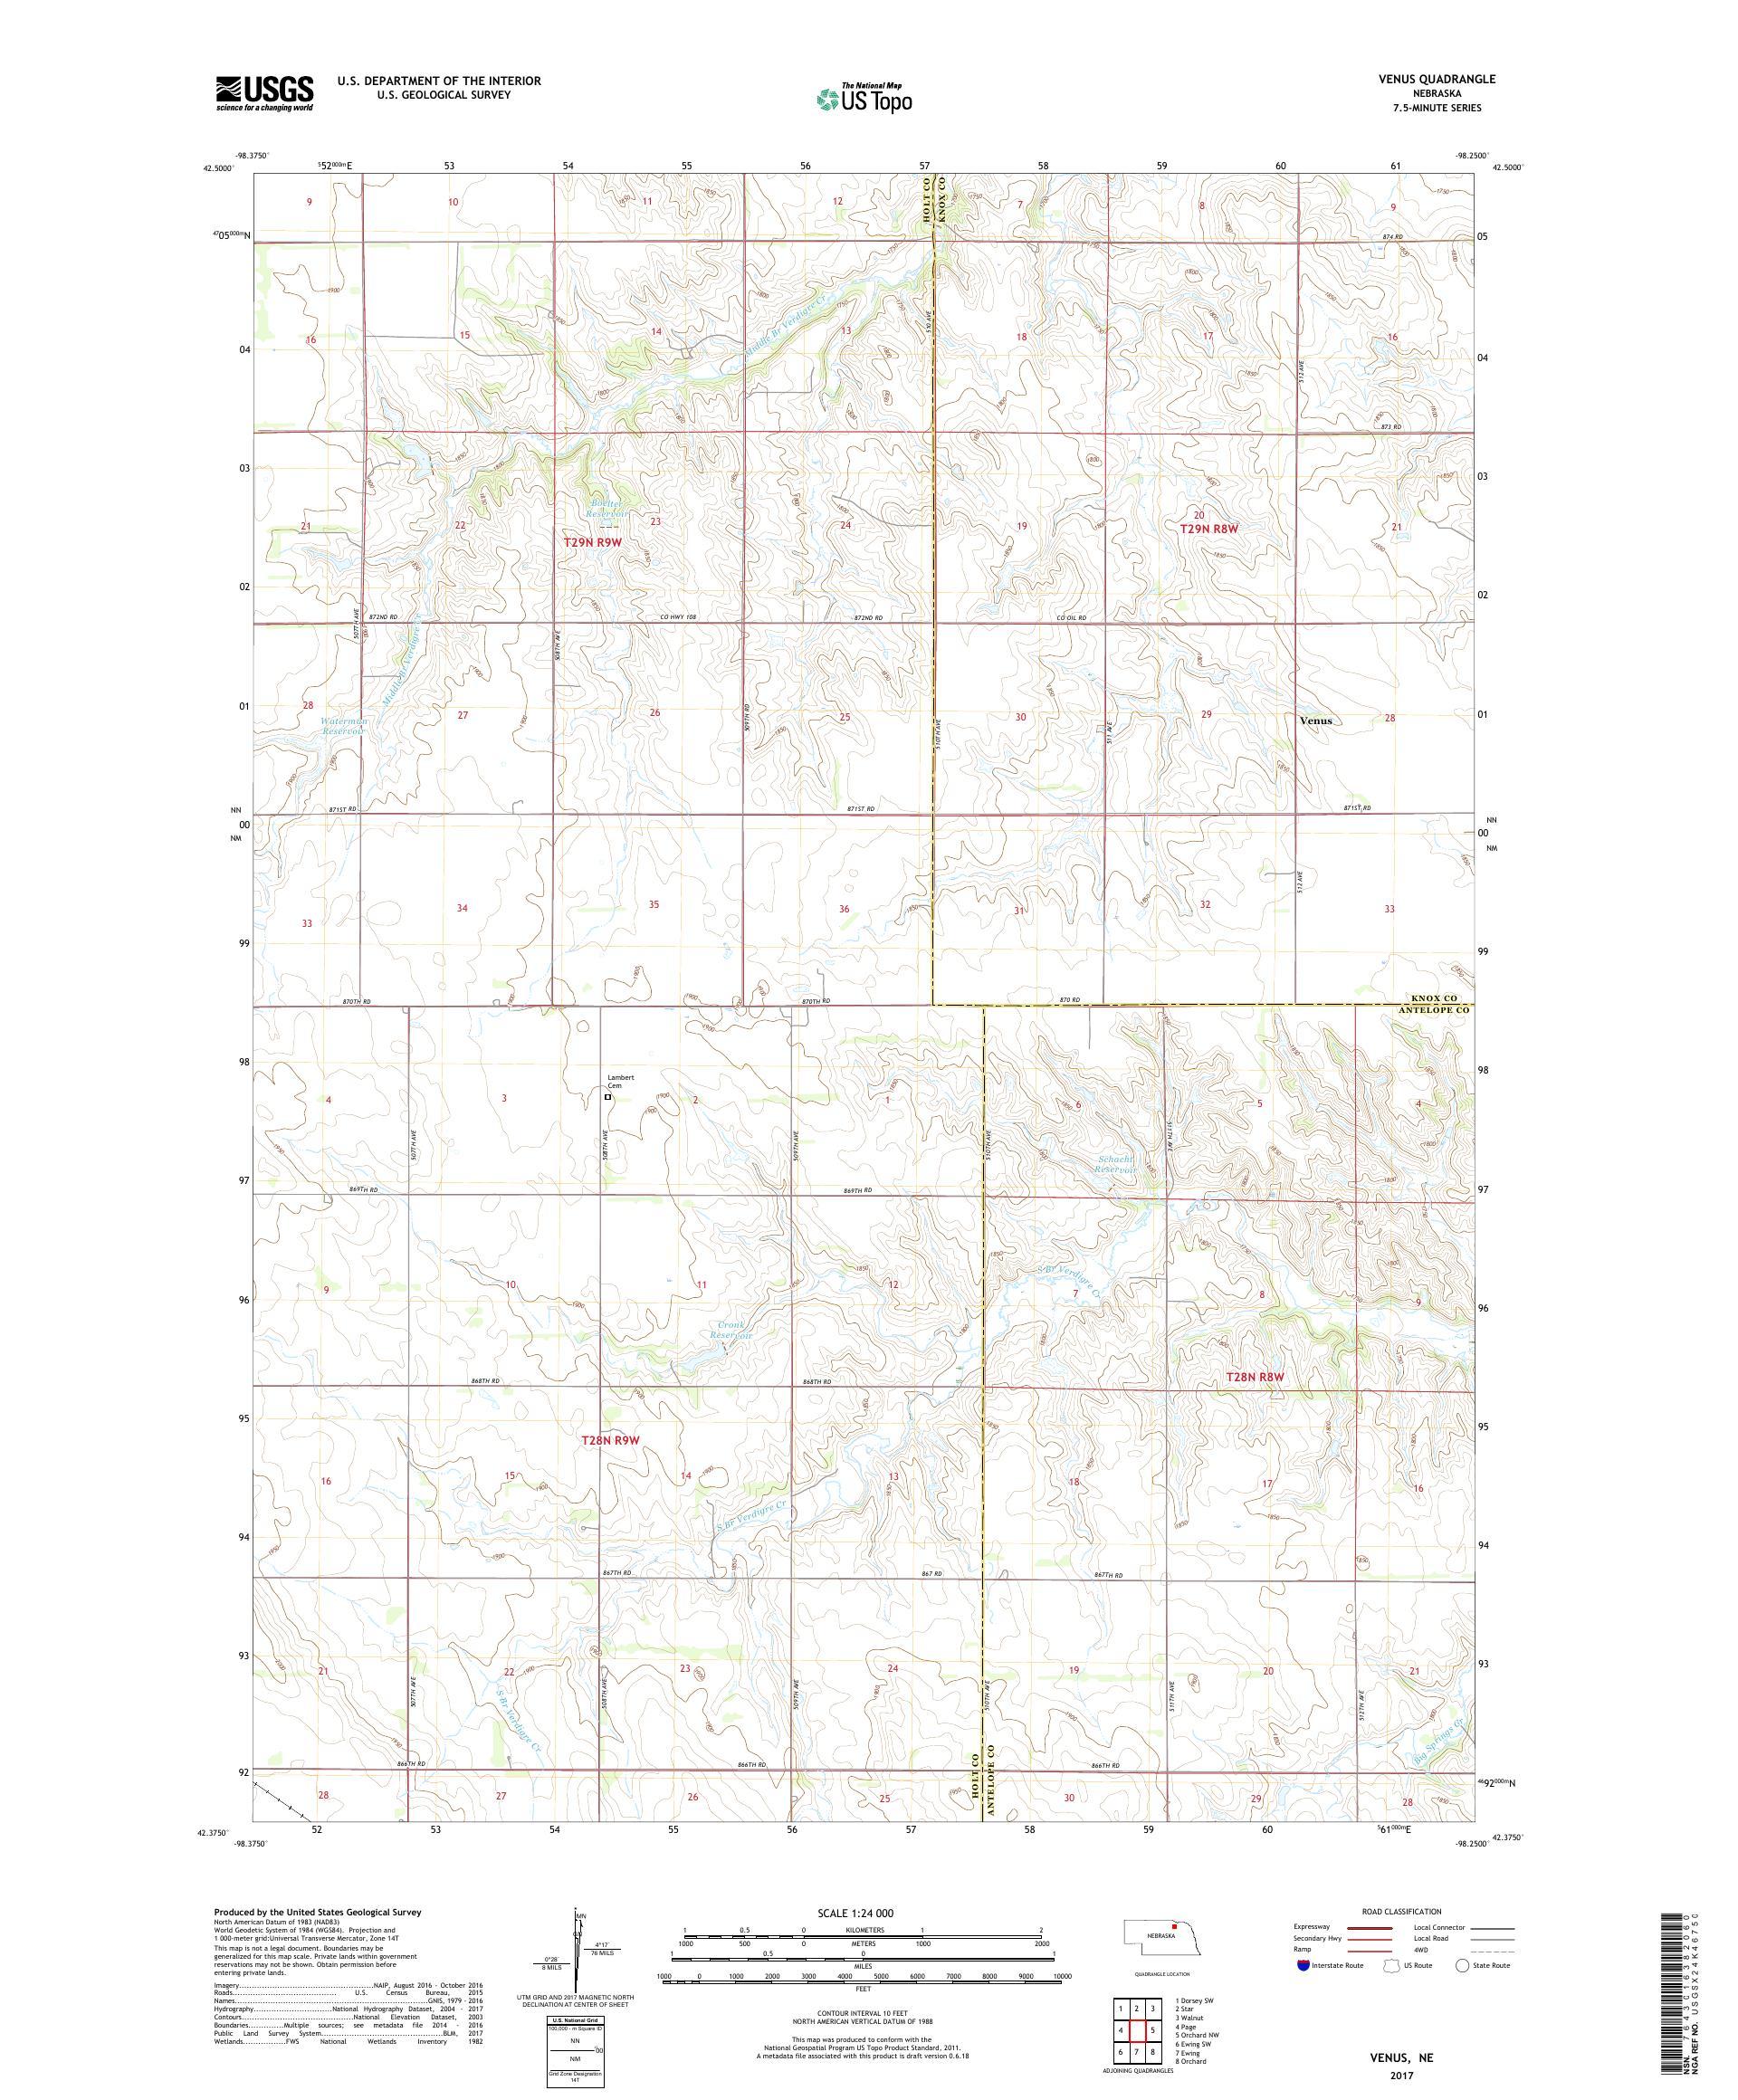 MyTopo Venus, Neska USGS Quad Topo Map on